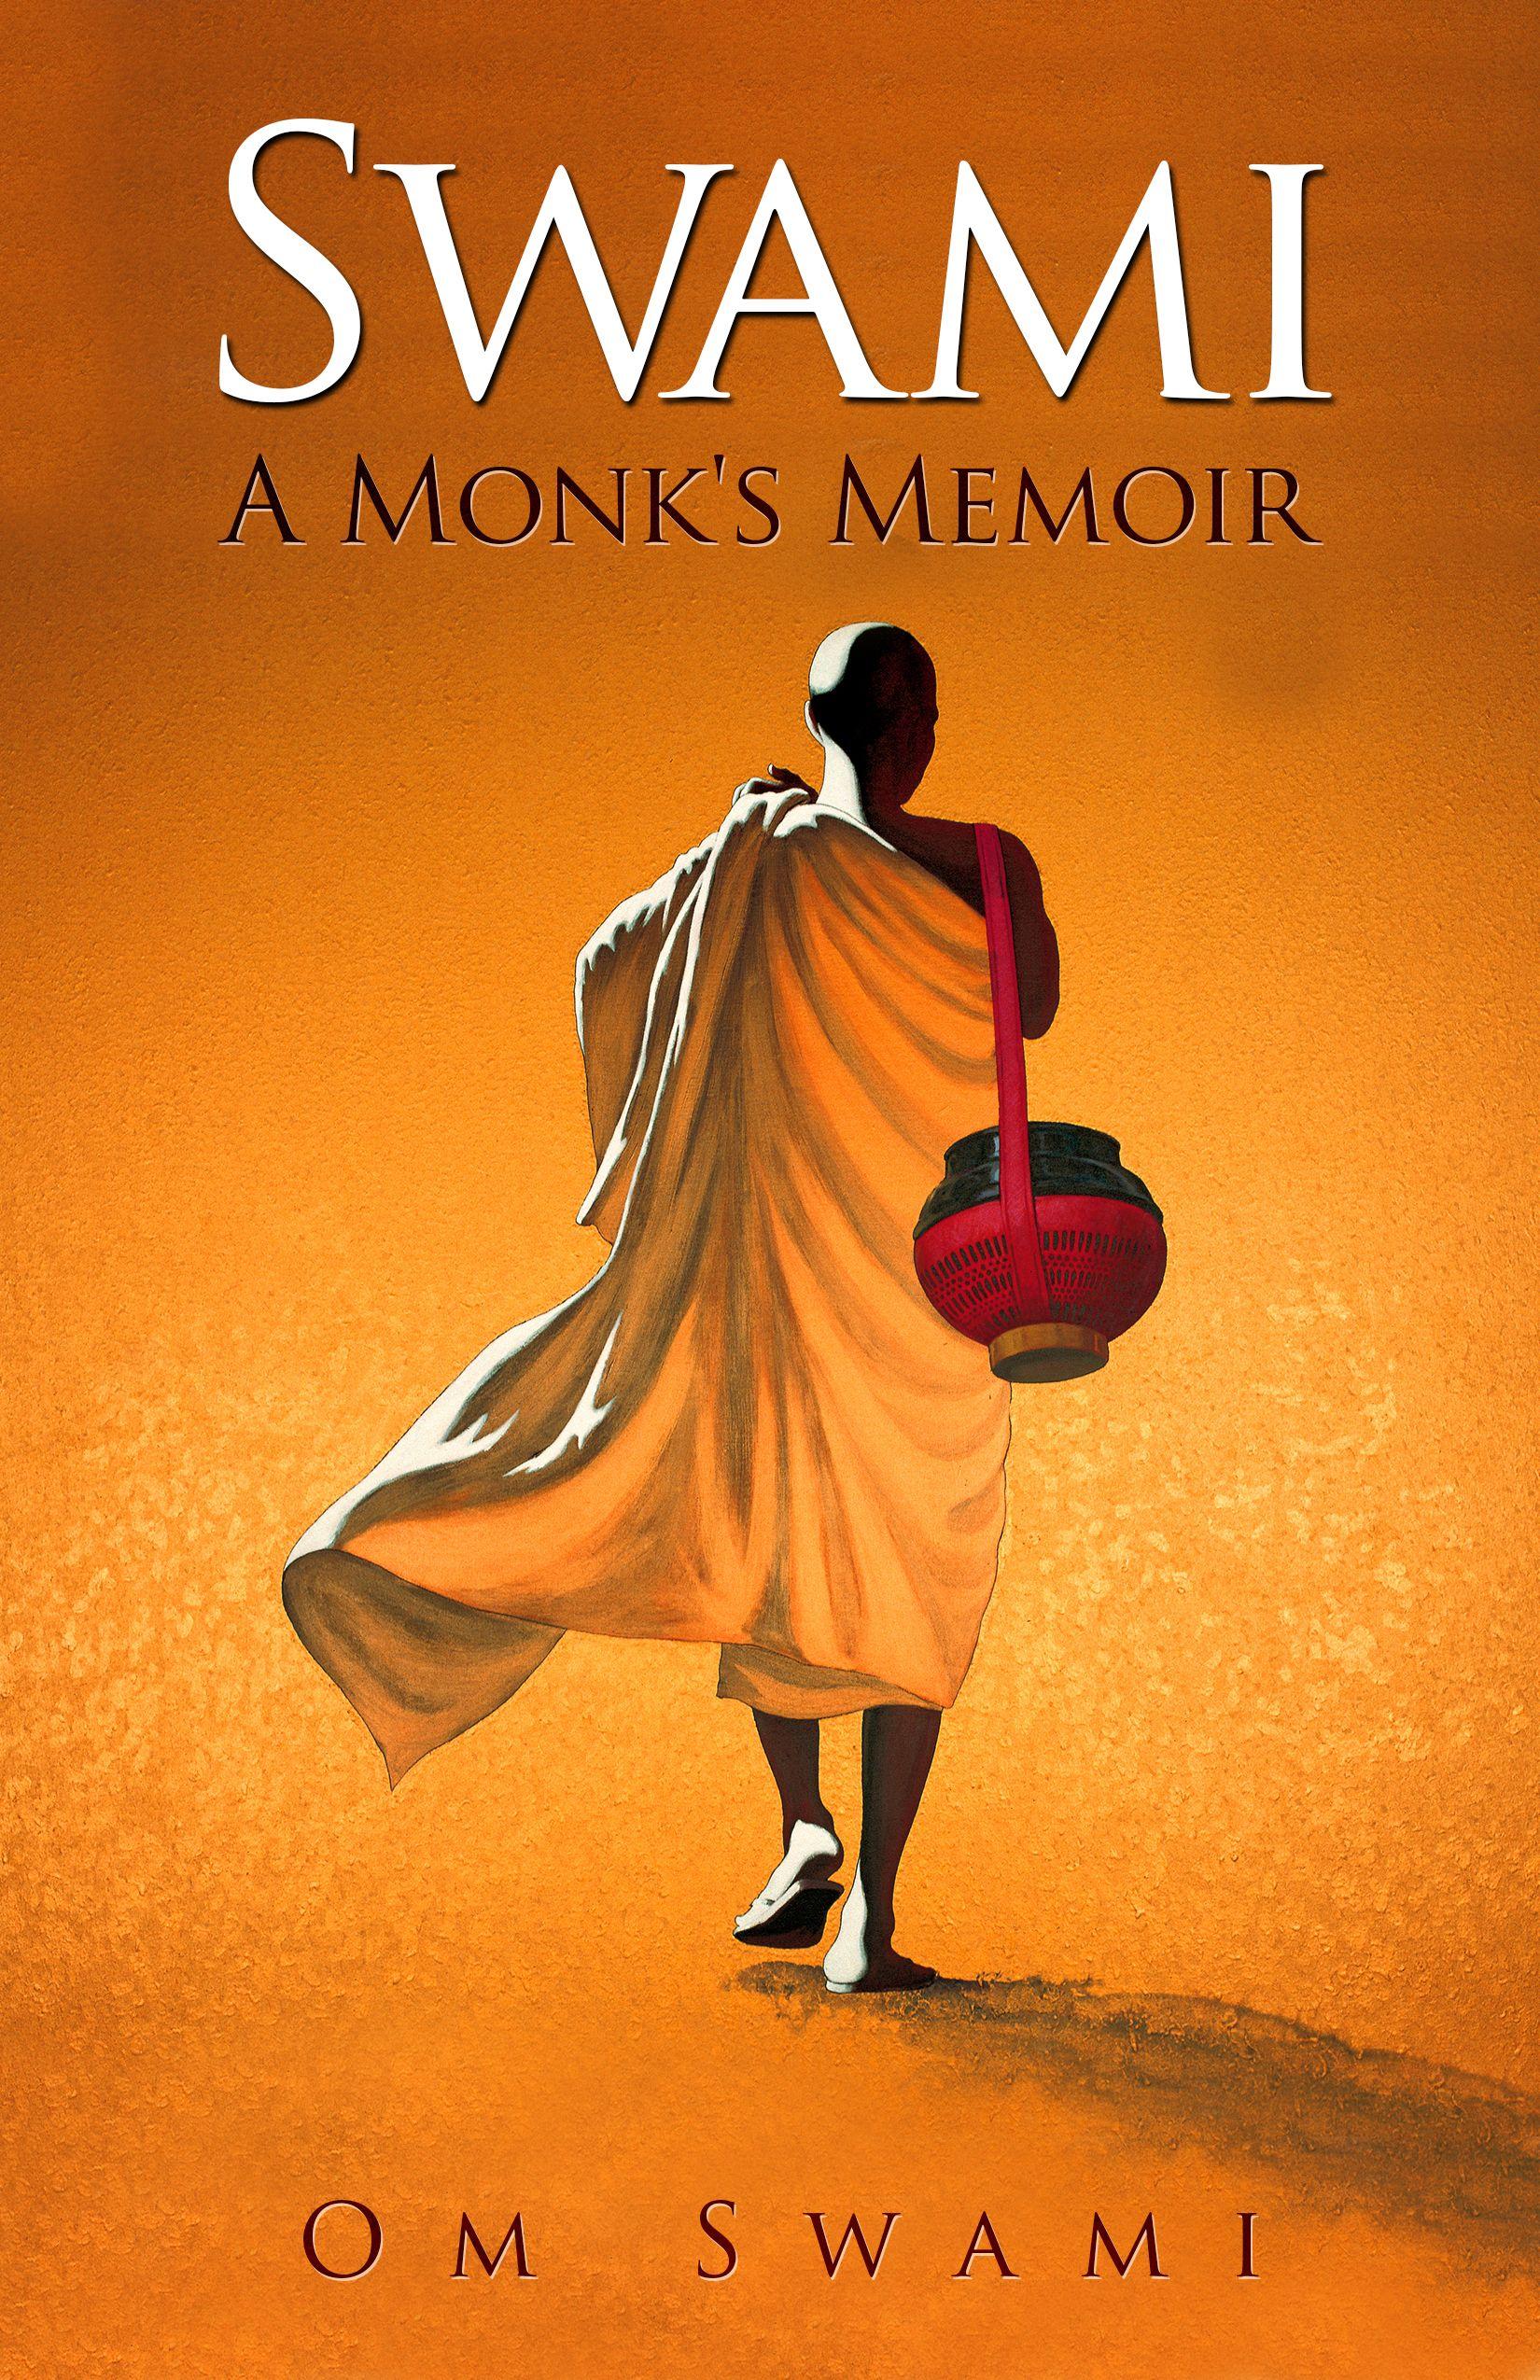 Book cover design   Swami - A Monk's Memoir by Om Swami